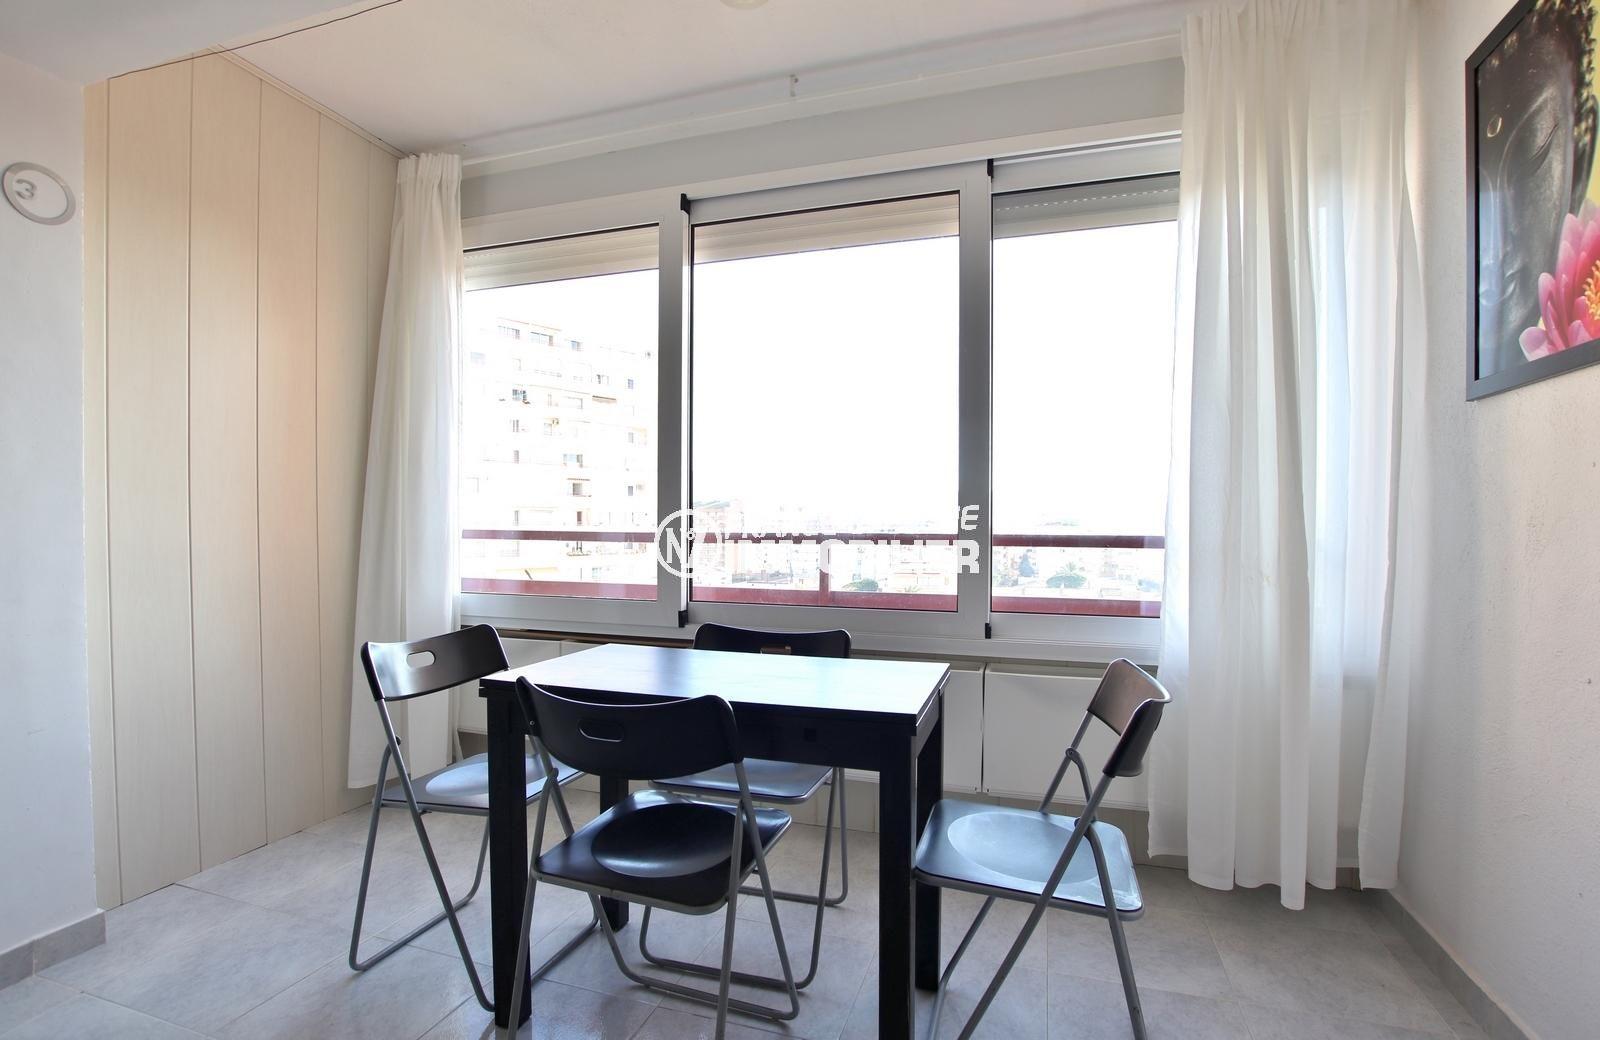 immo roses: studio ref.3845, le coin repas dans la pièce principale